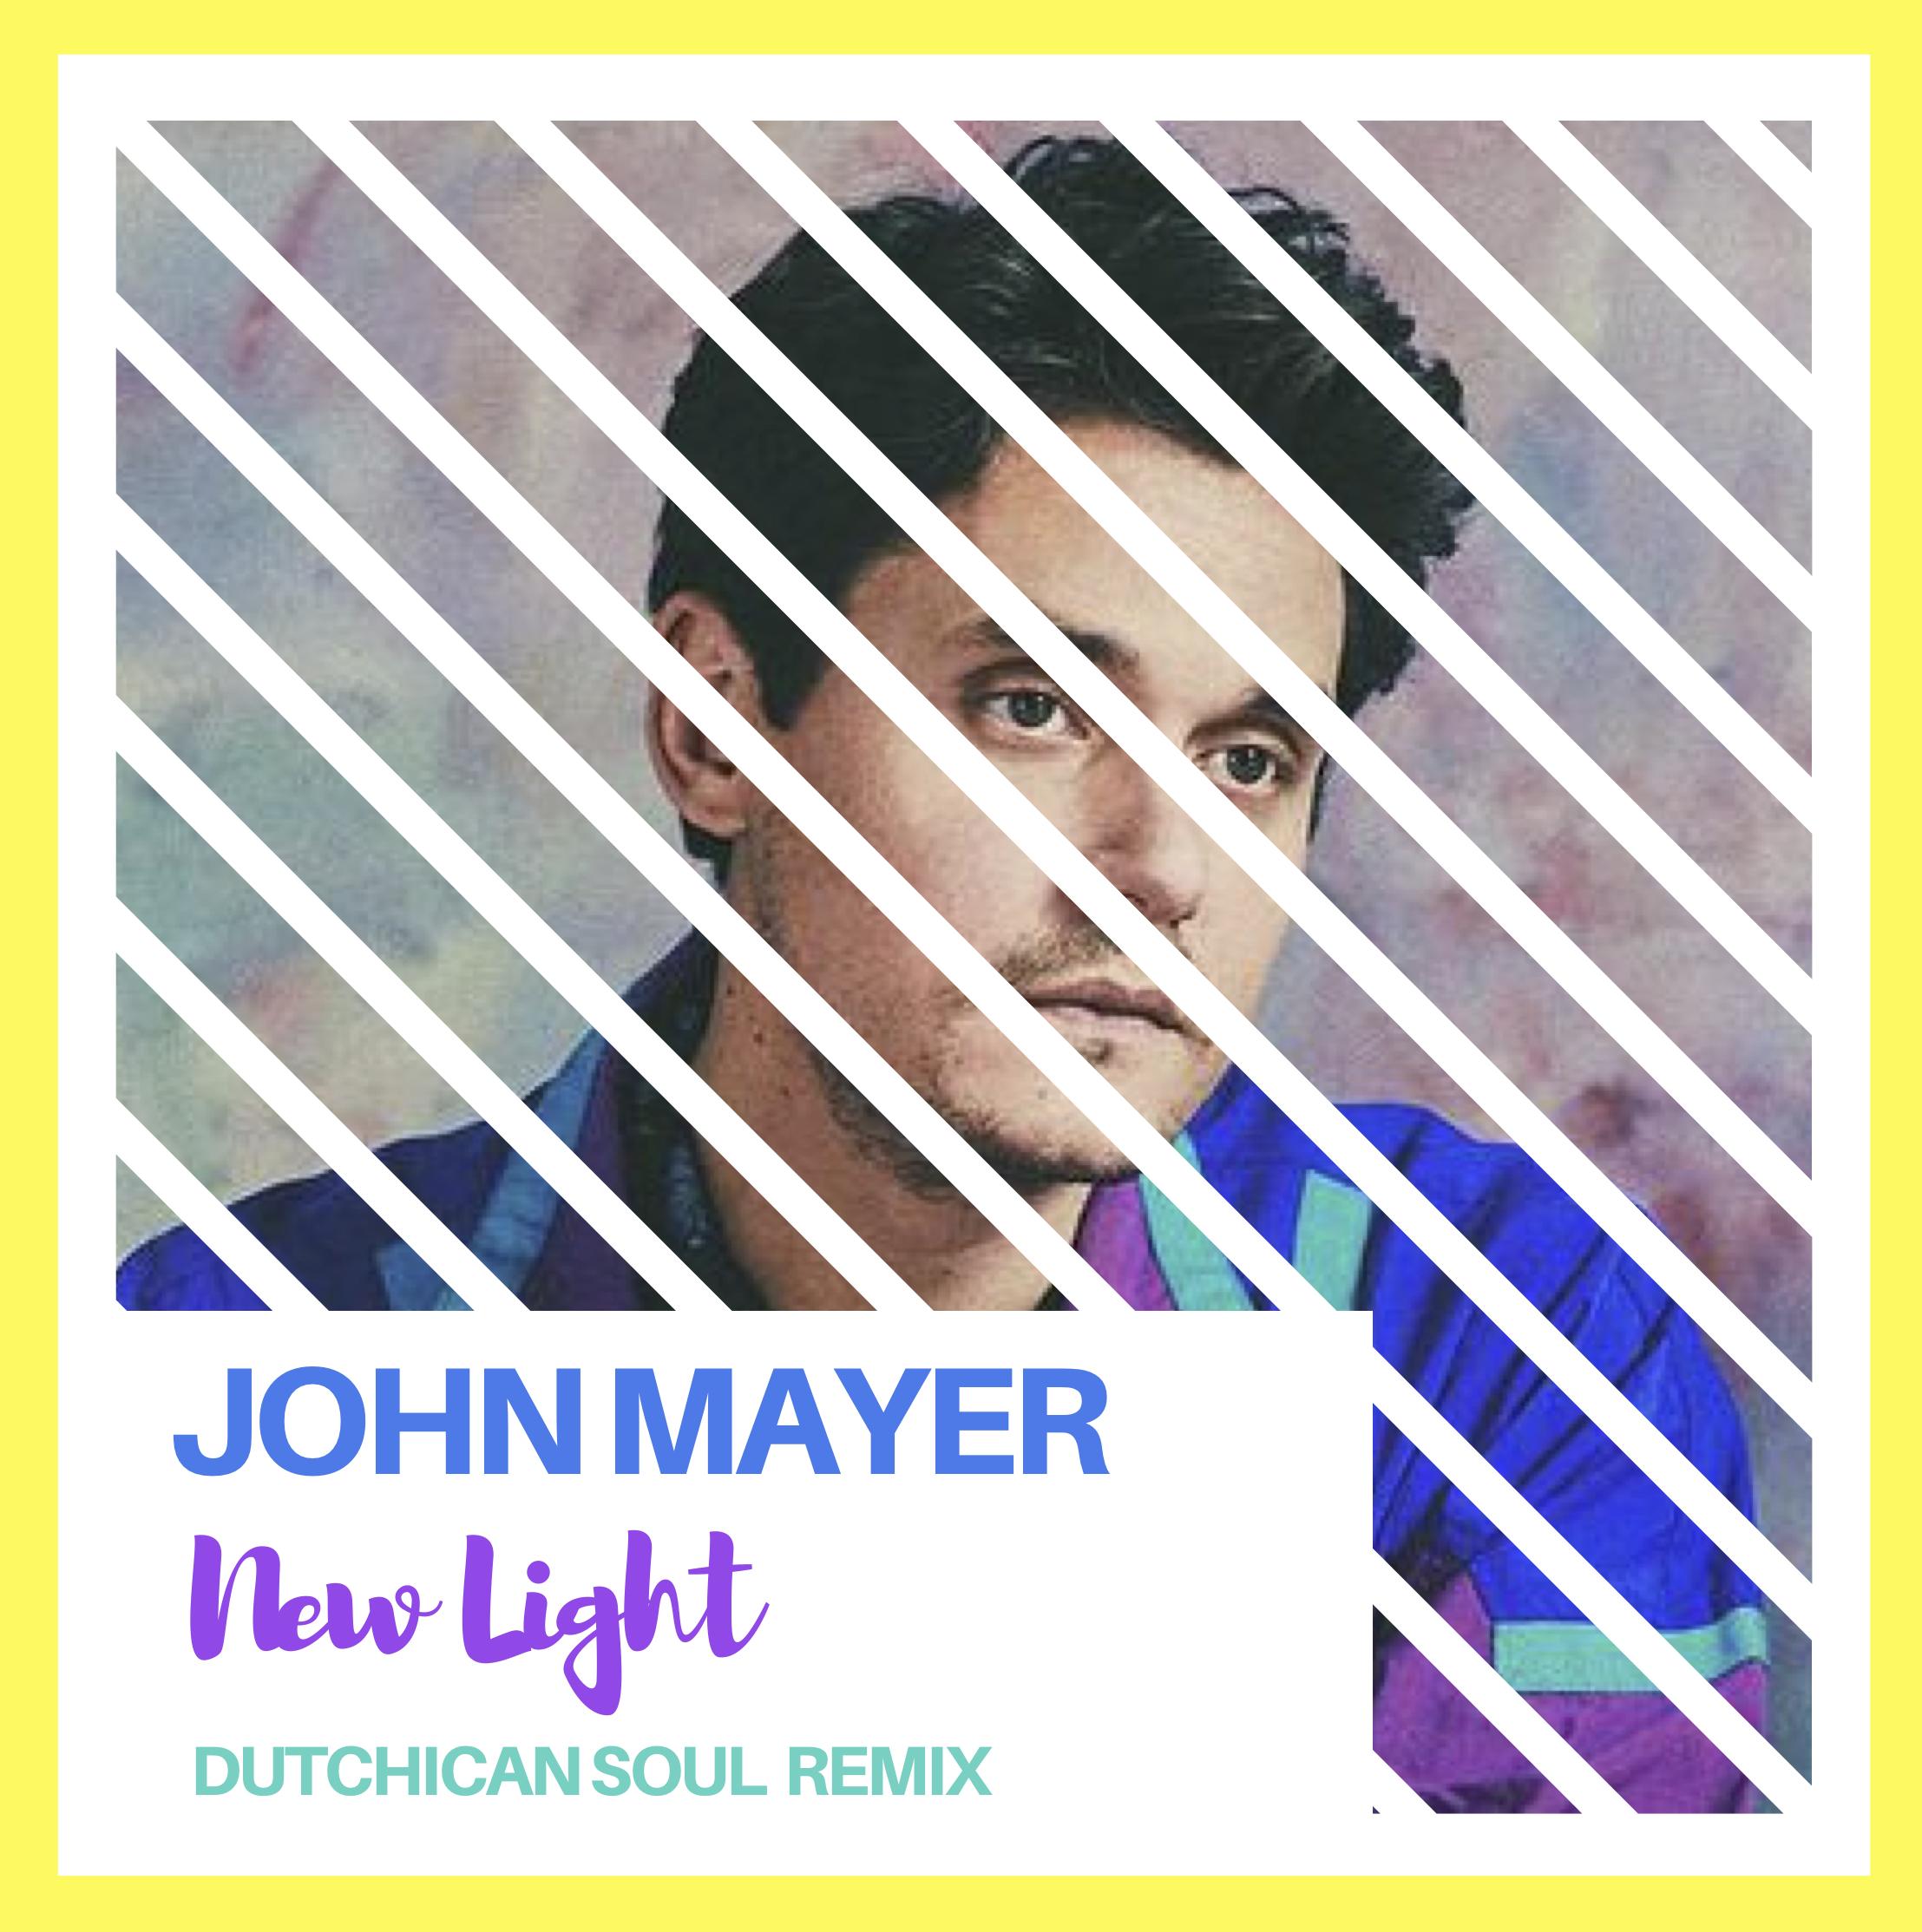 john mayer dutchican soul